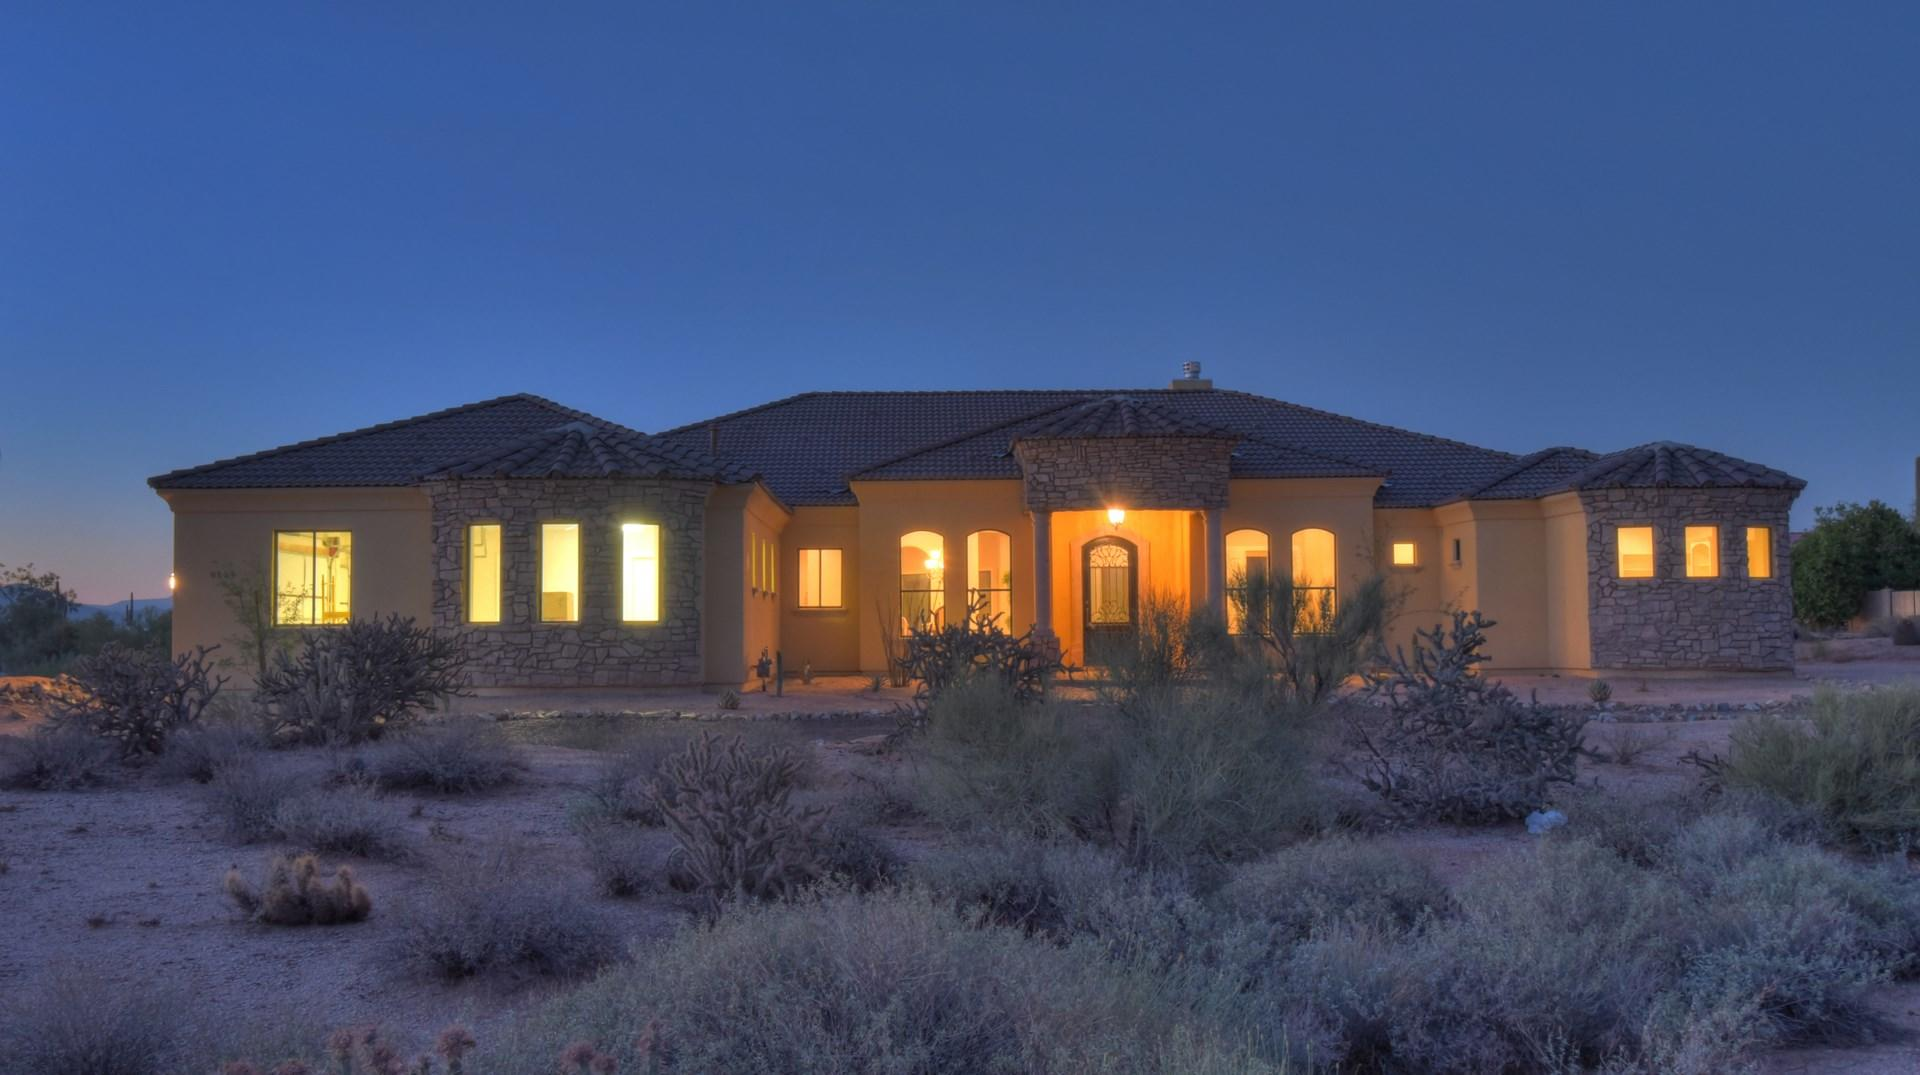 Best Kitchen Gallery: Bellevue Plan For Sale Scottsdale Az Trulia of Scottsdale Arizona Home Builder on rachelxblog.com